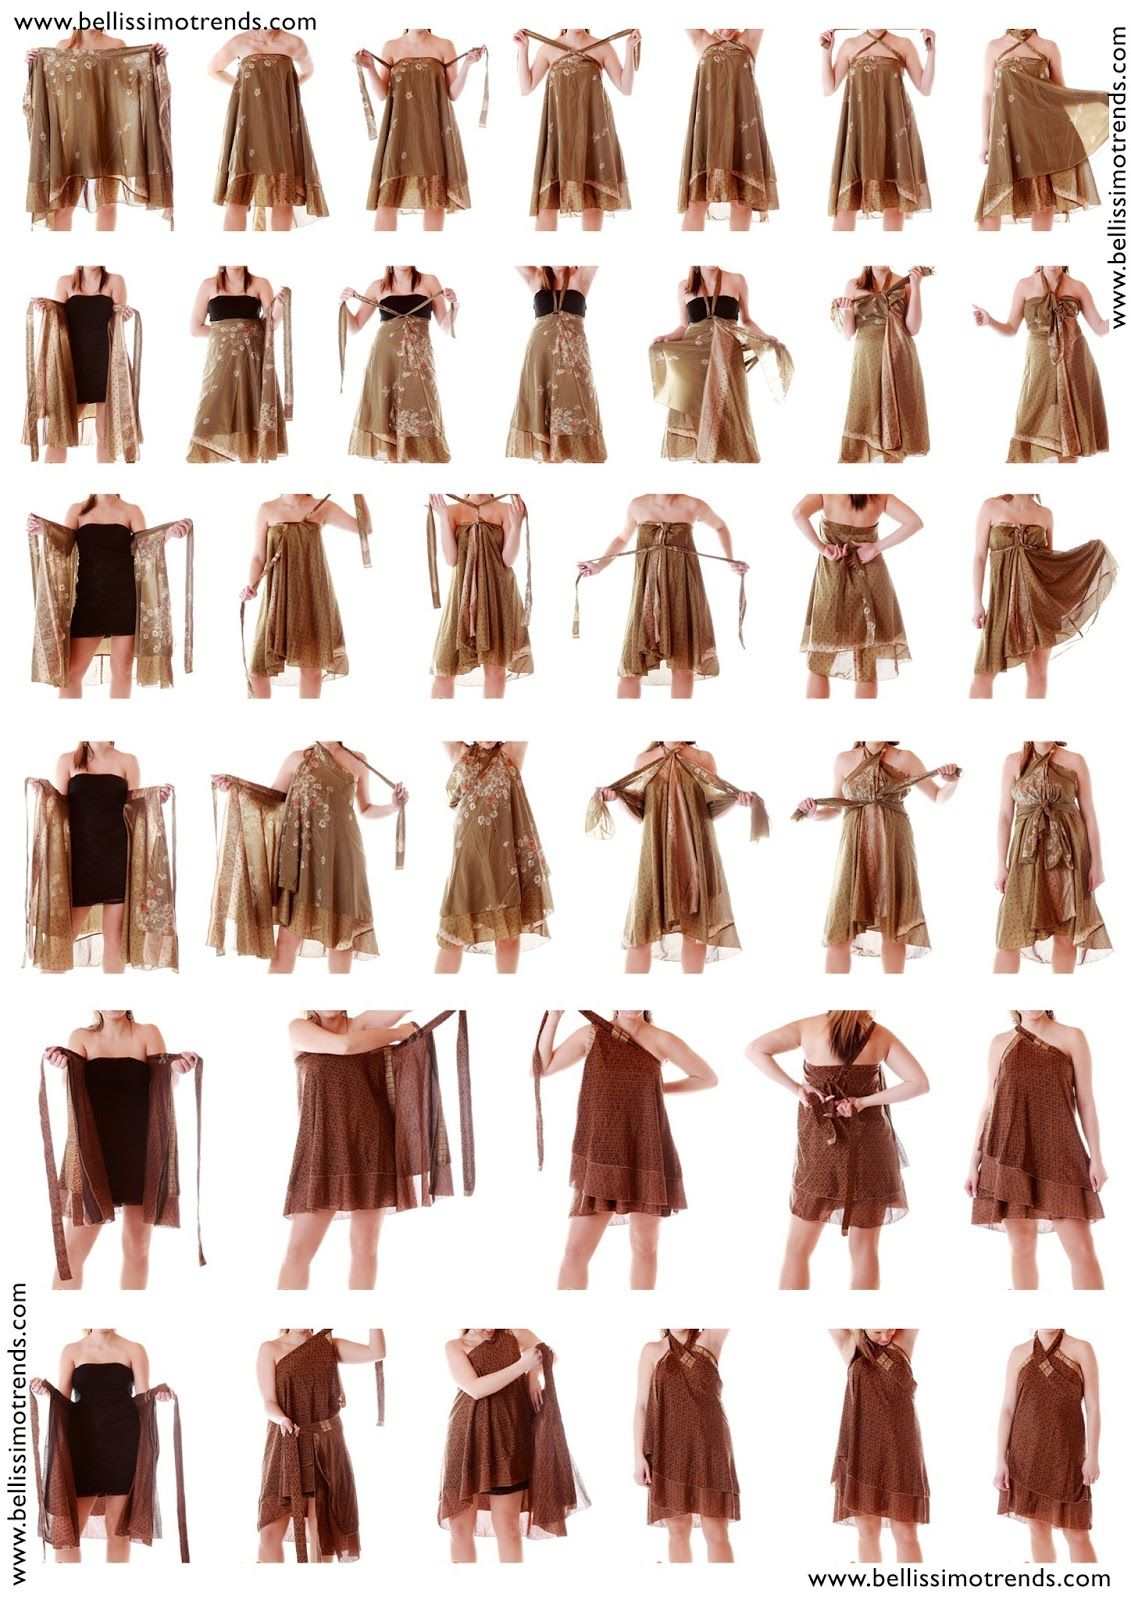 jupe Sarong polyvalente transformables | Couture: modèles ...